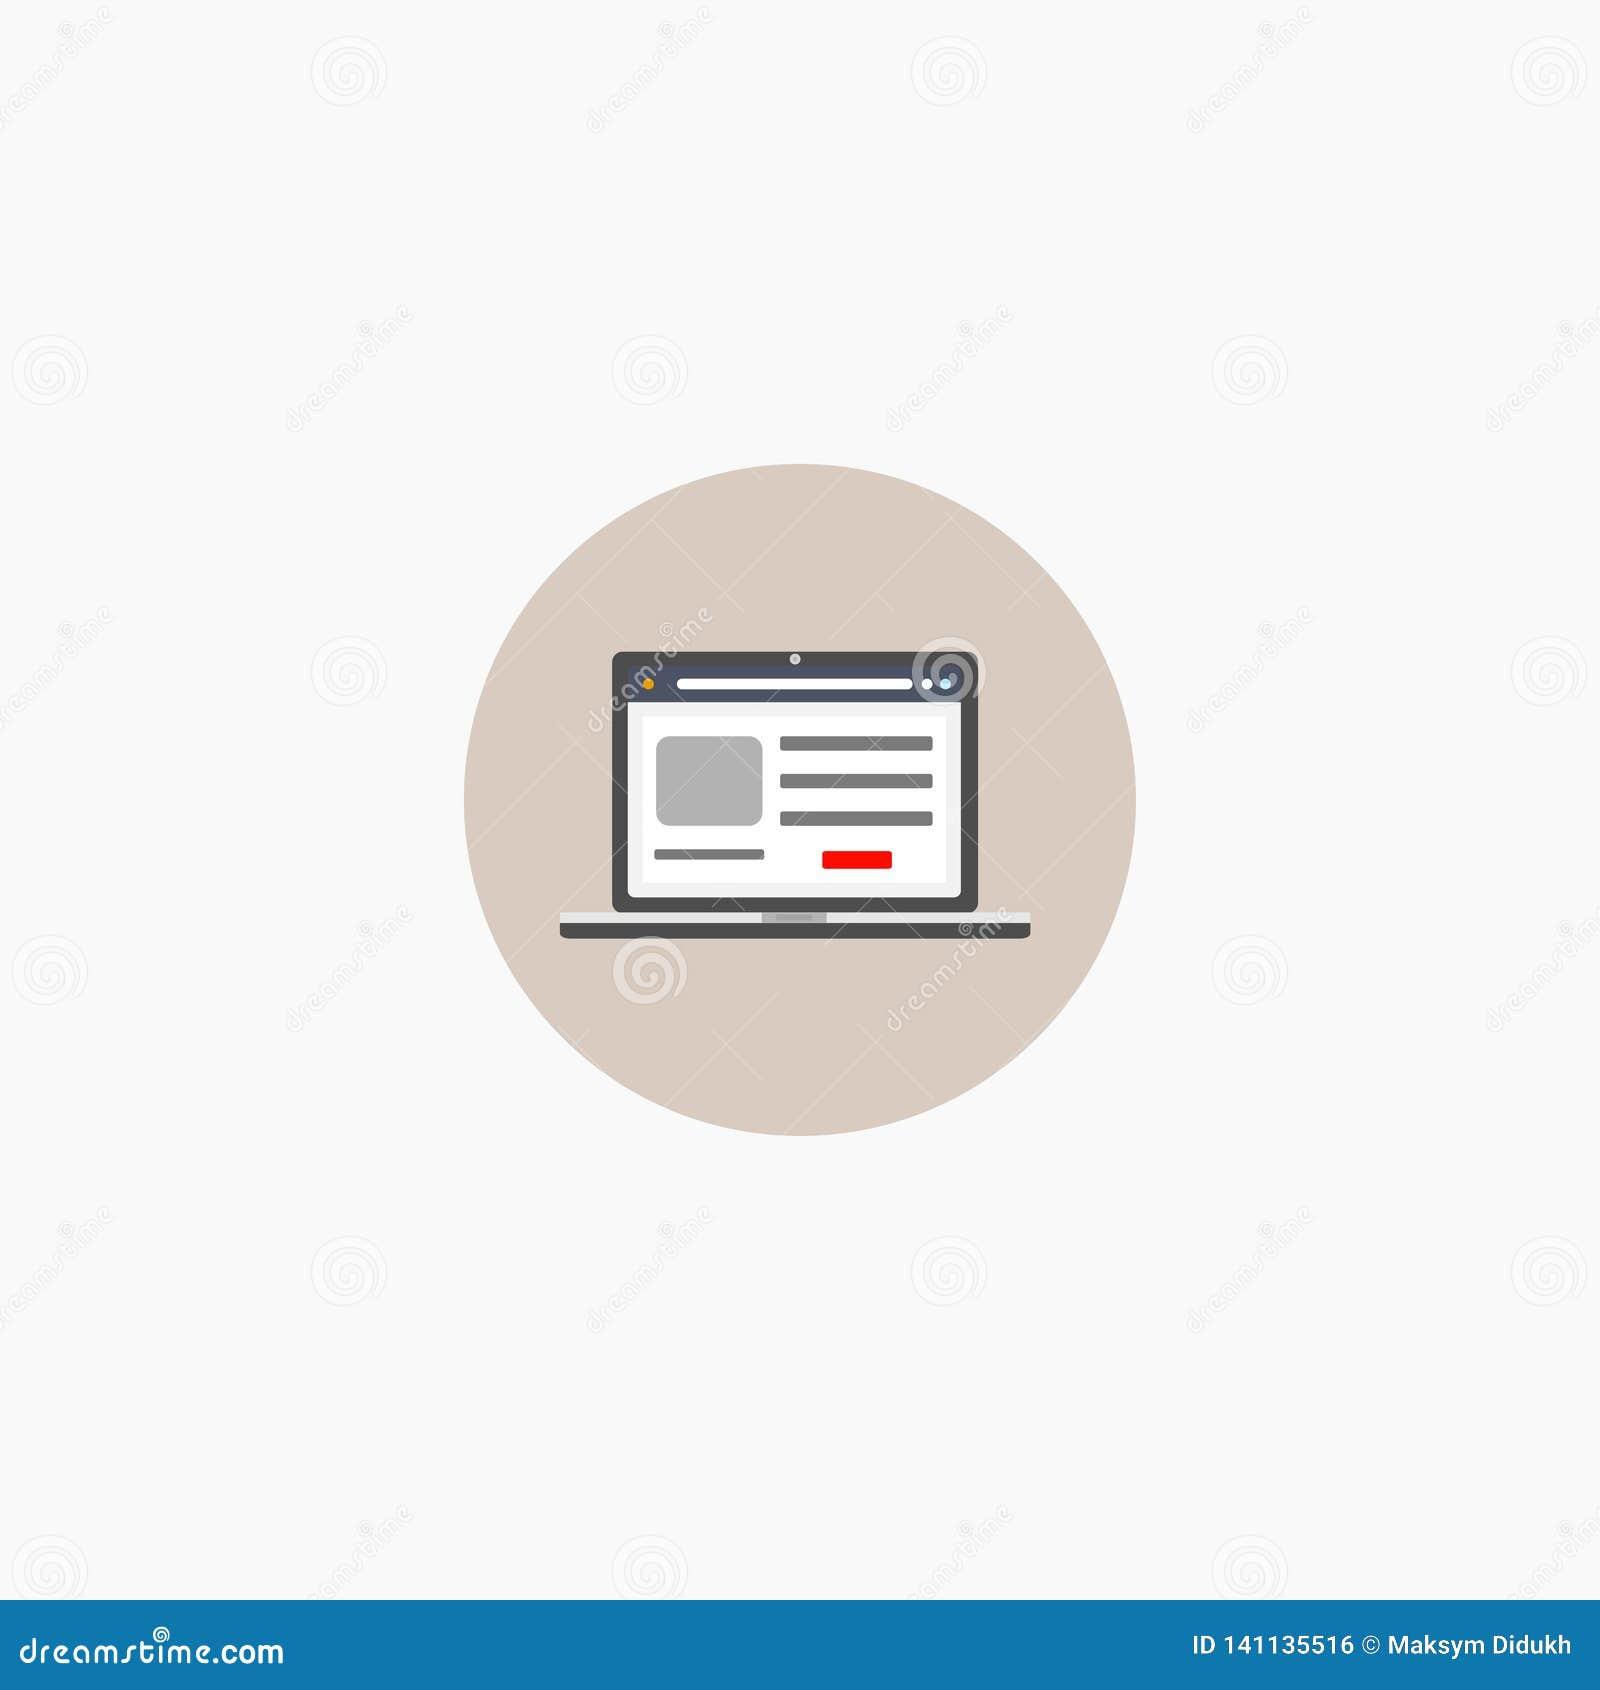 Laptop. Monitor. Icon. Logo. Vector illustration. EPS 10